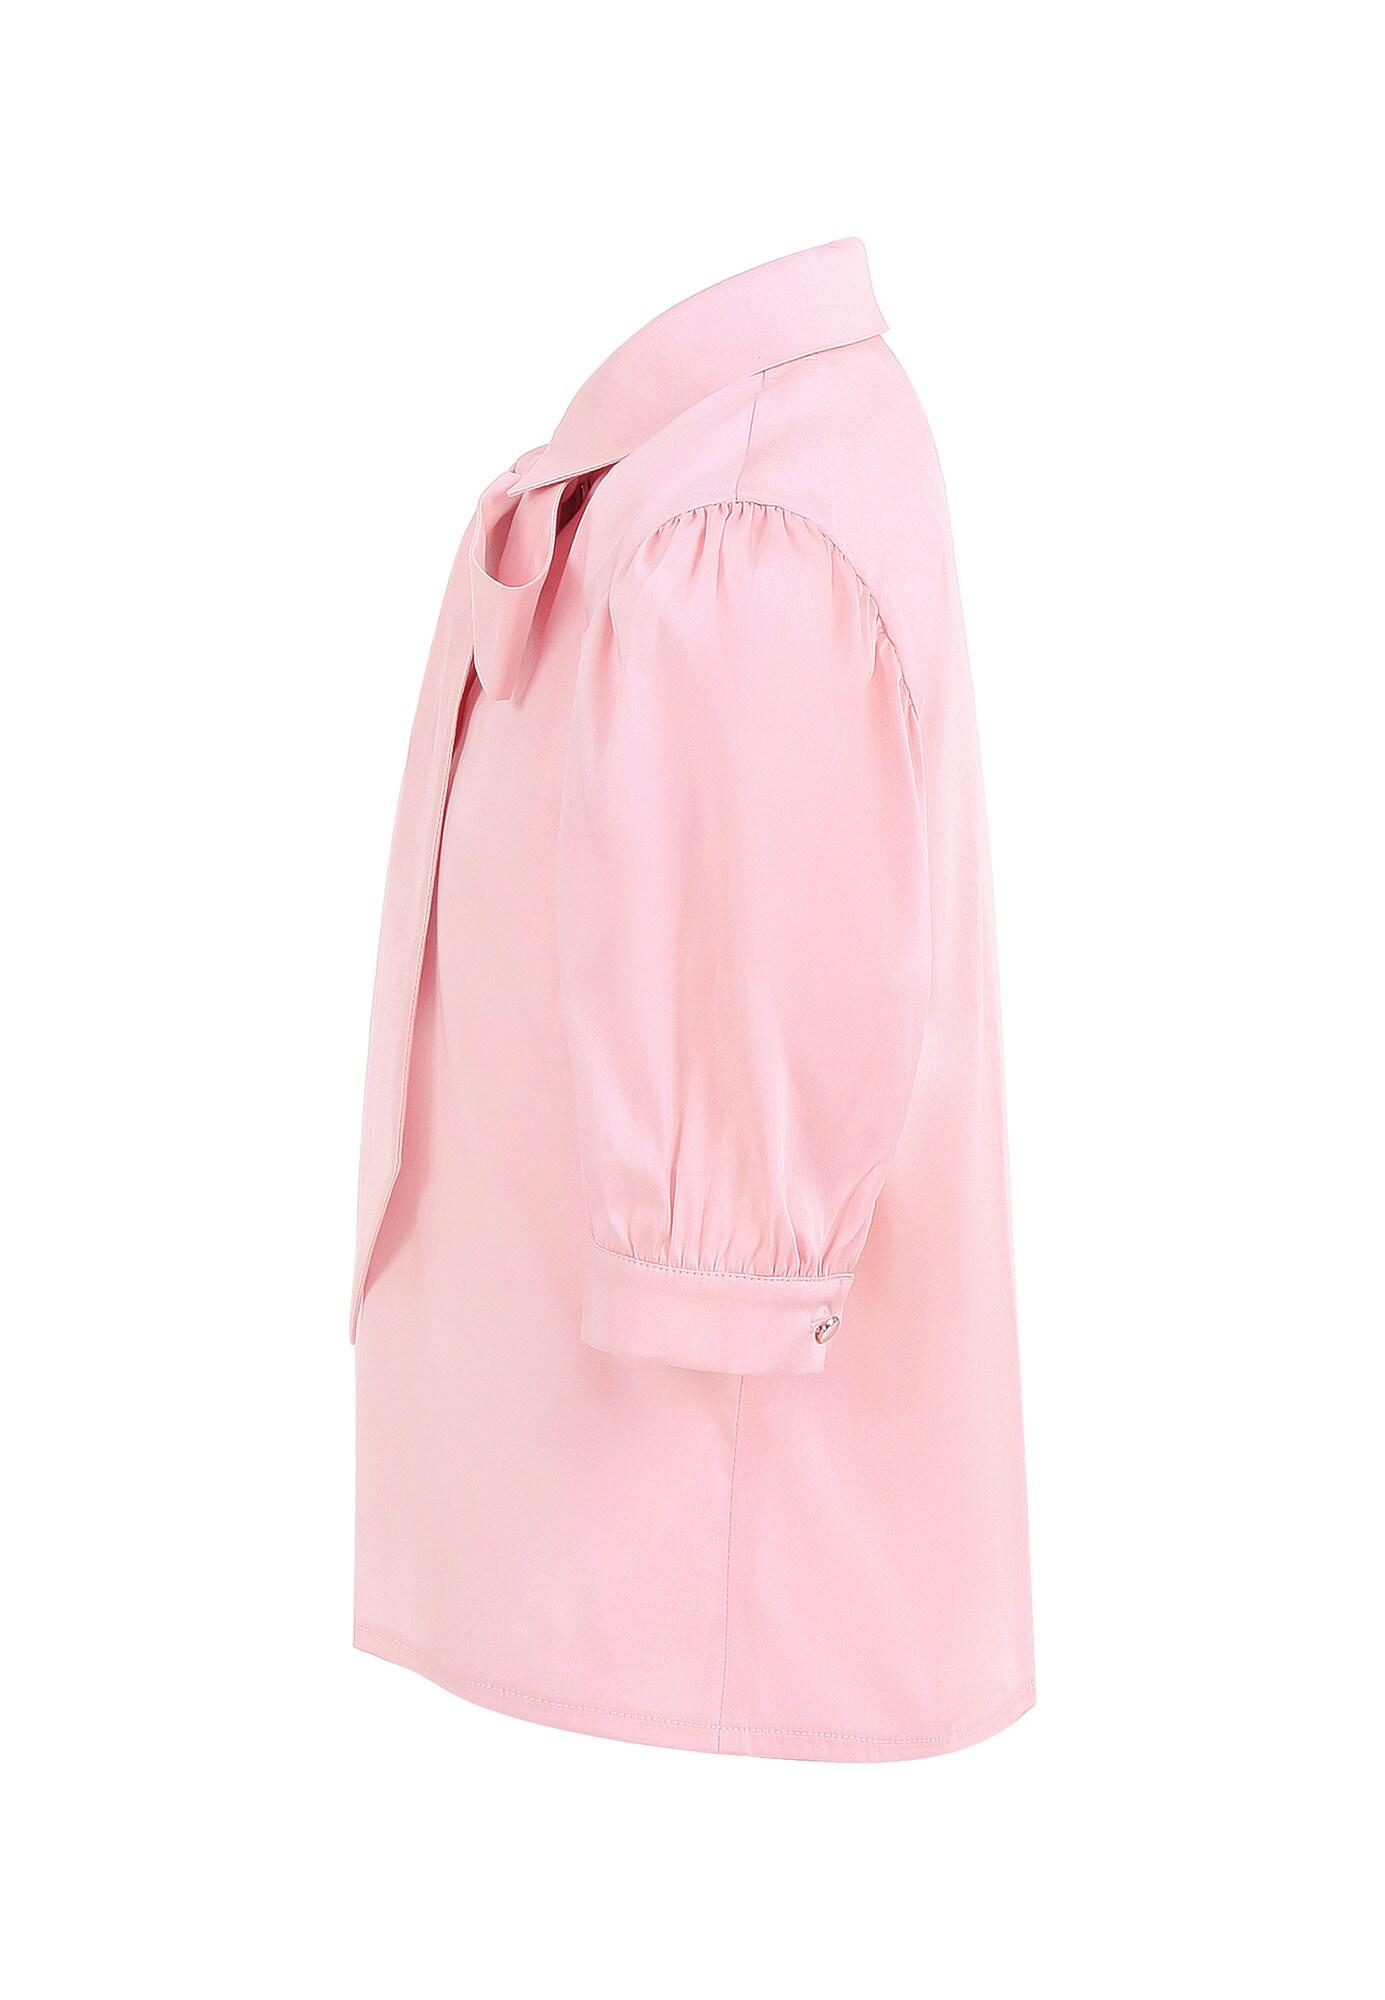 Gebriel Juno Bluse pink